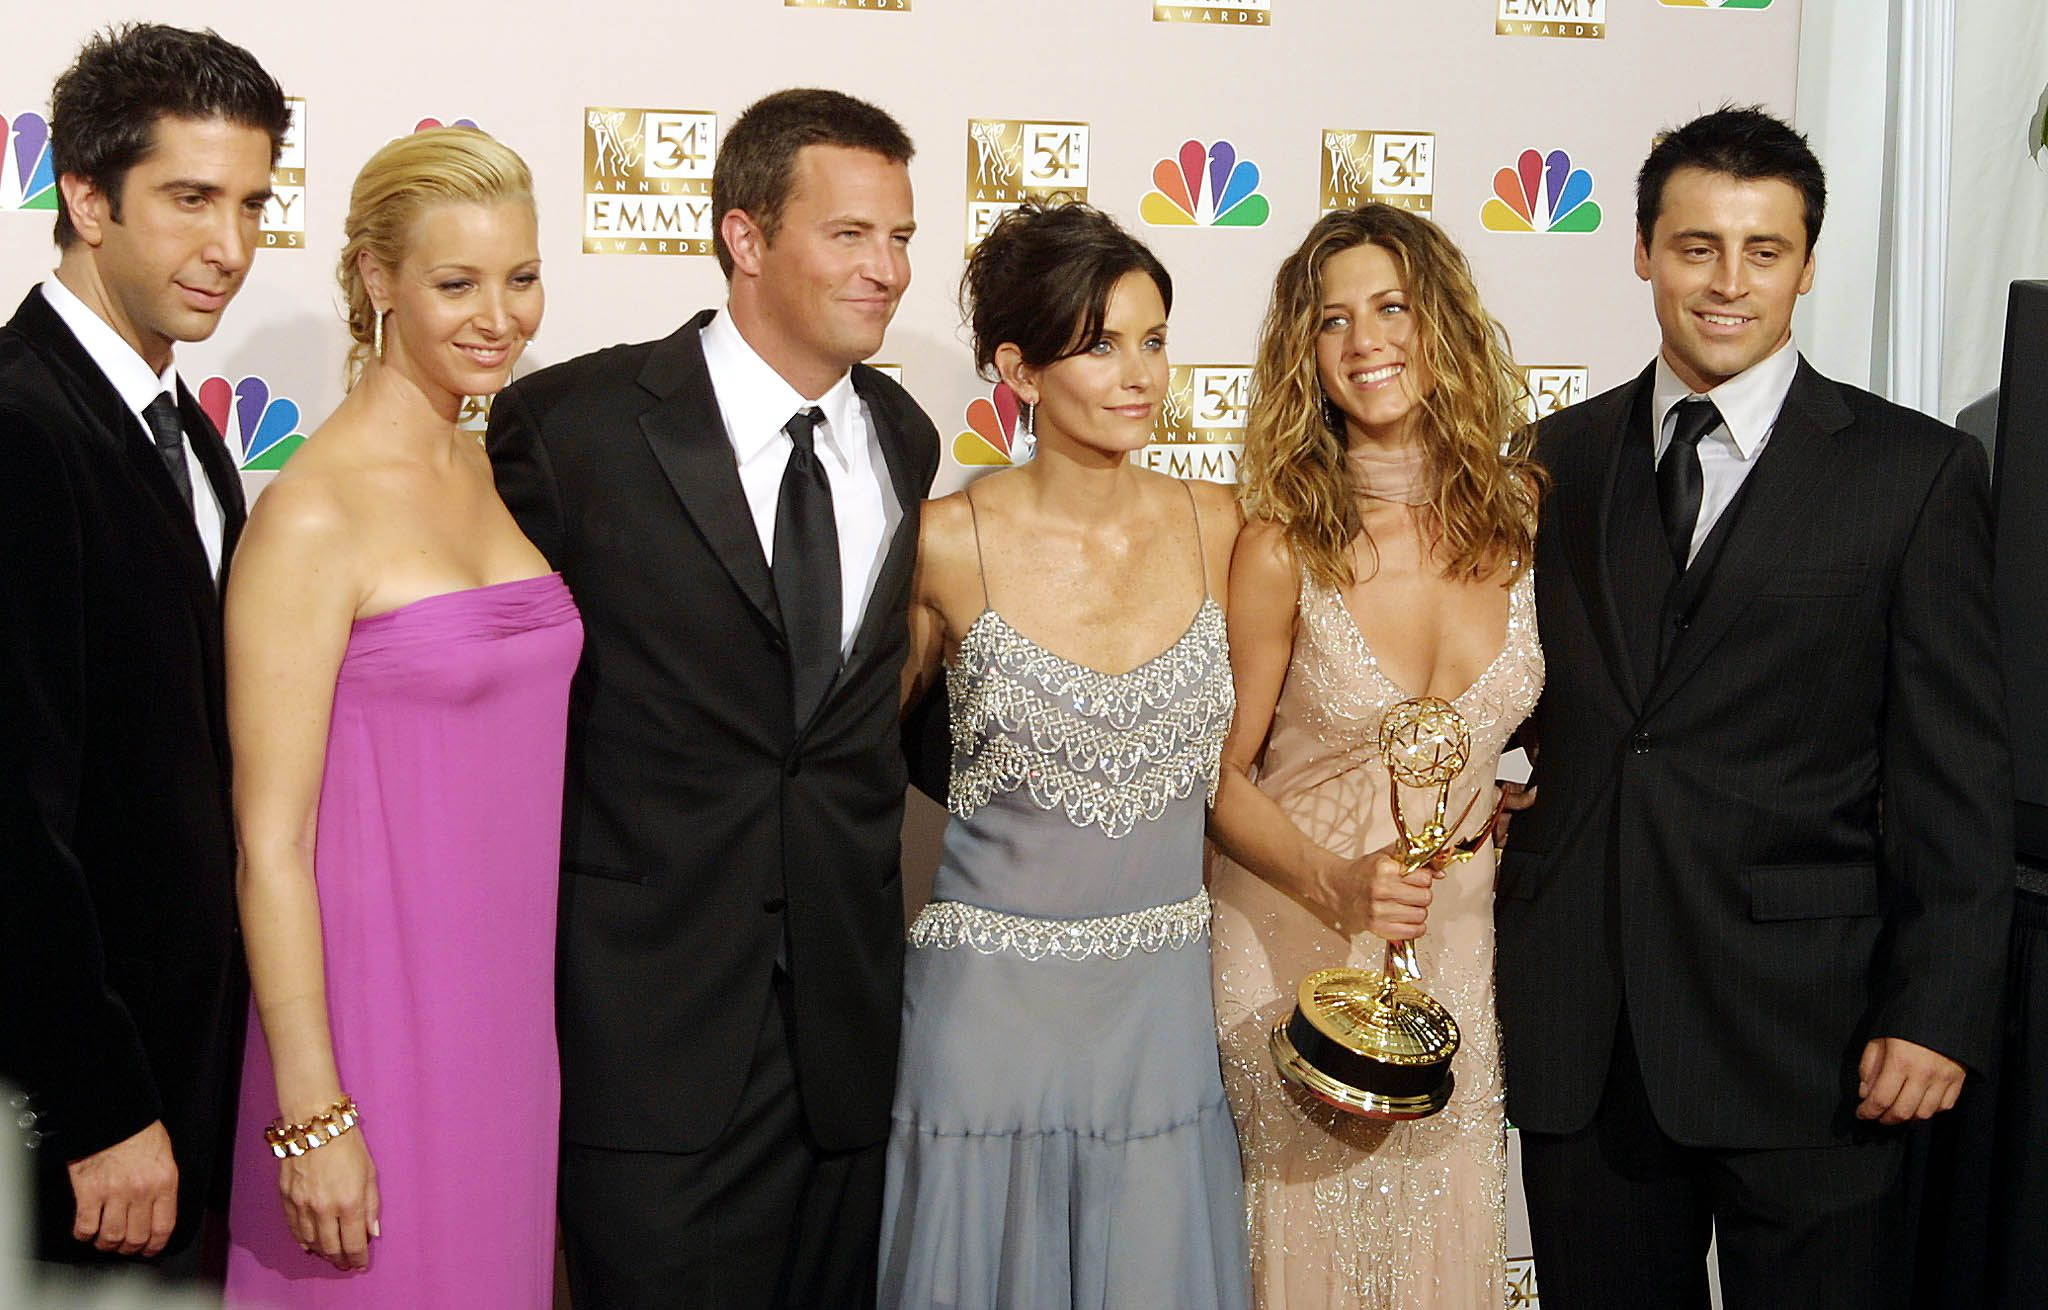 The 'Friends' cast